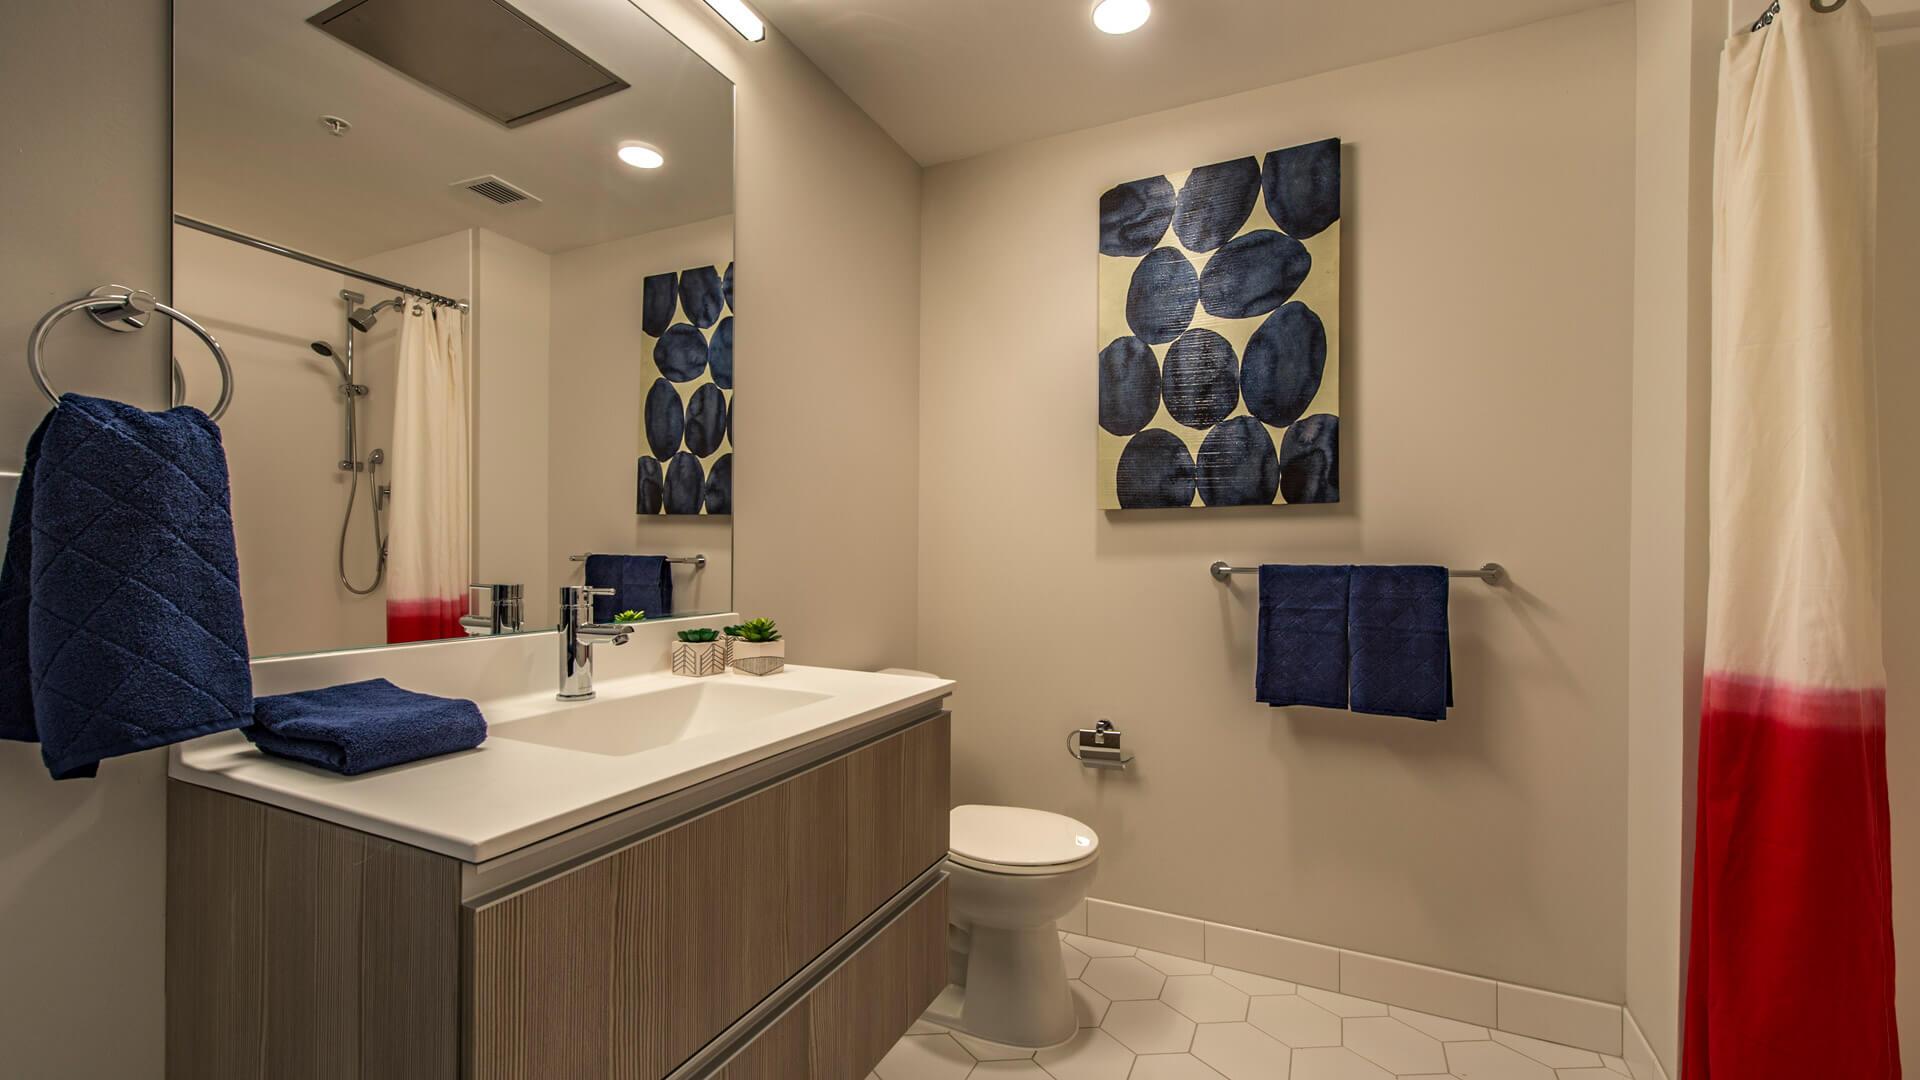 Apartments img 36